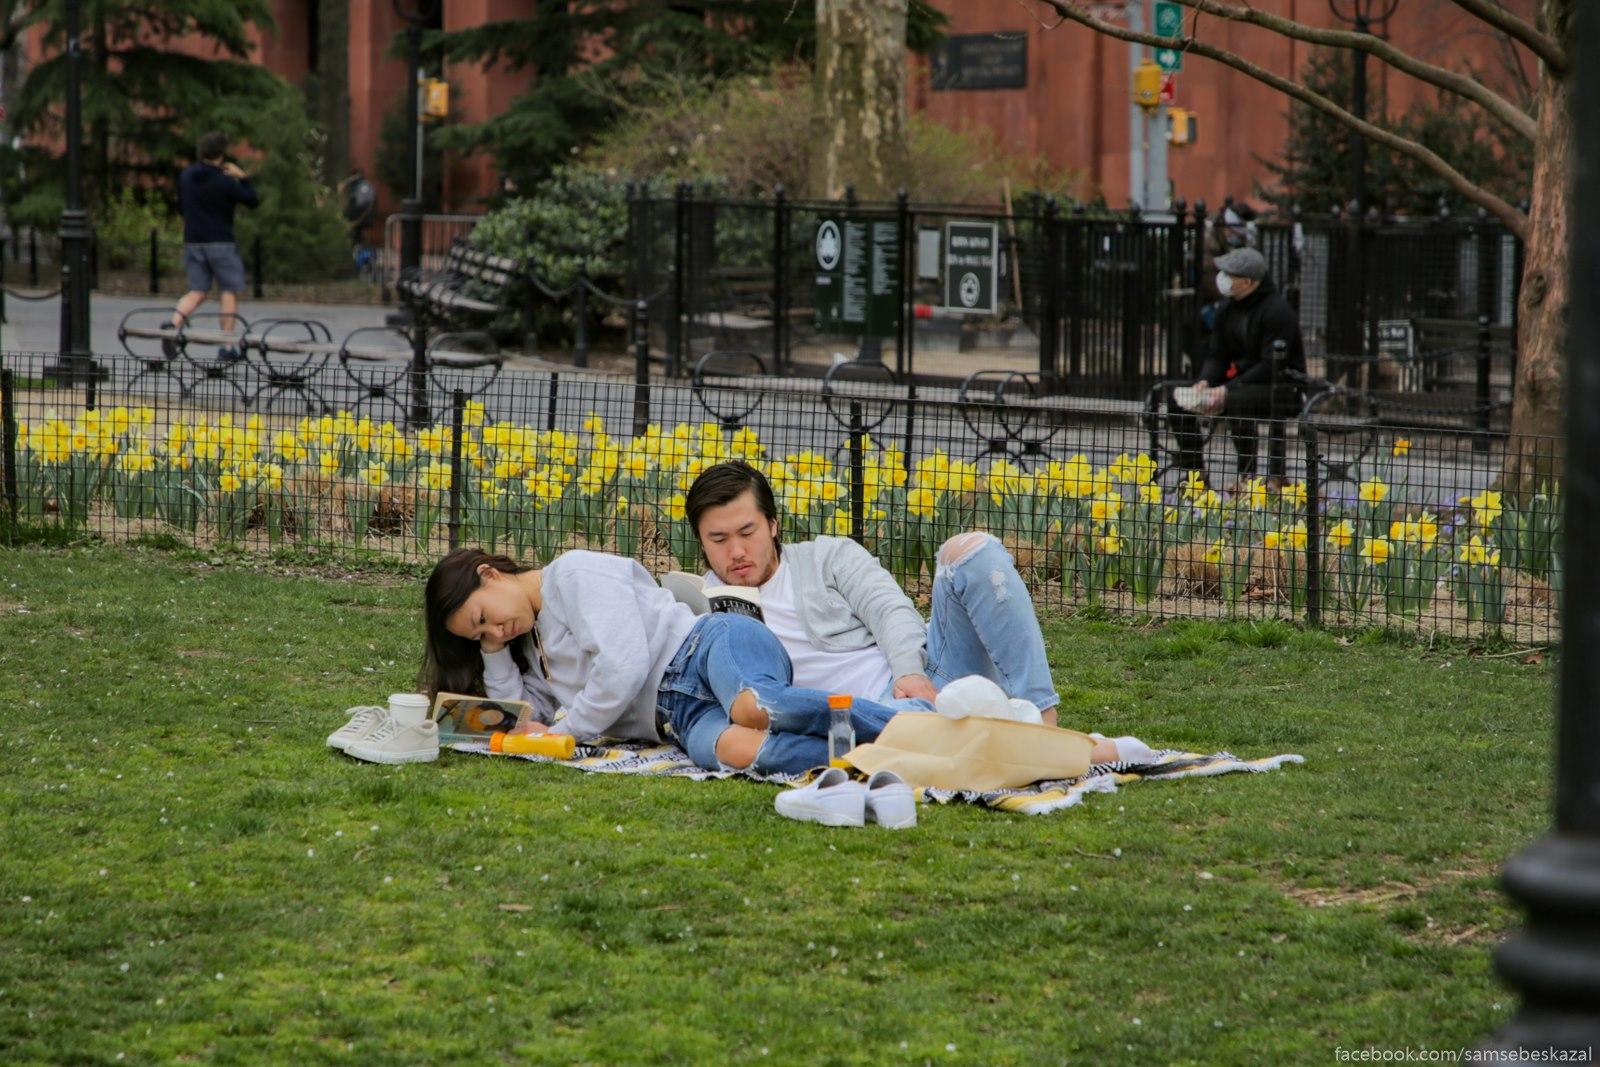 Piknik vo vrema pandemii....